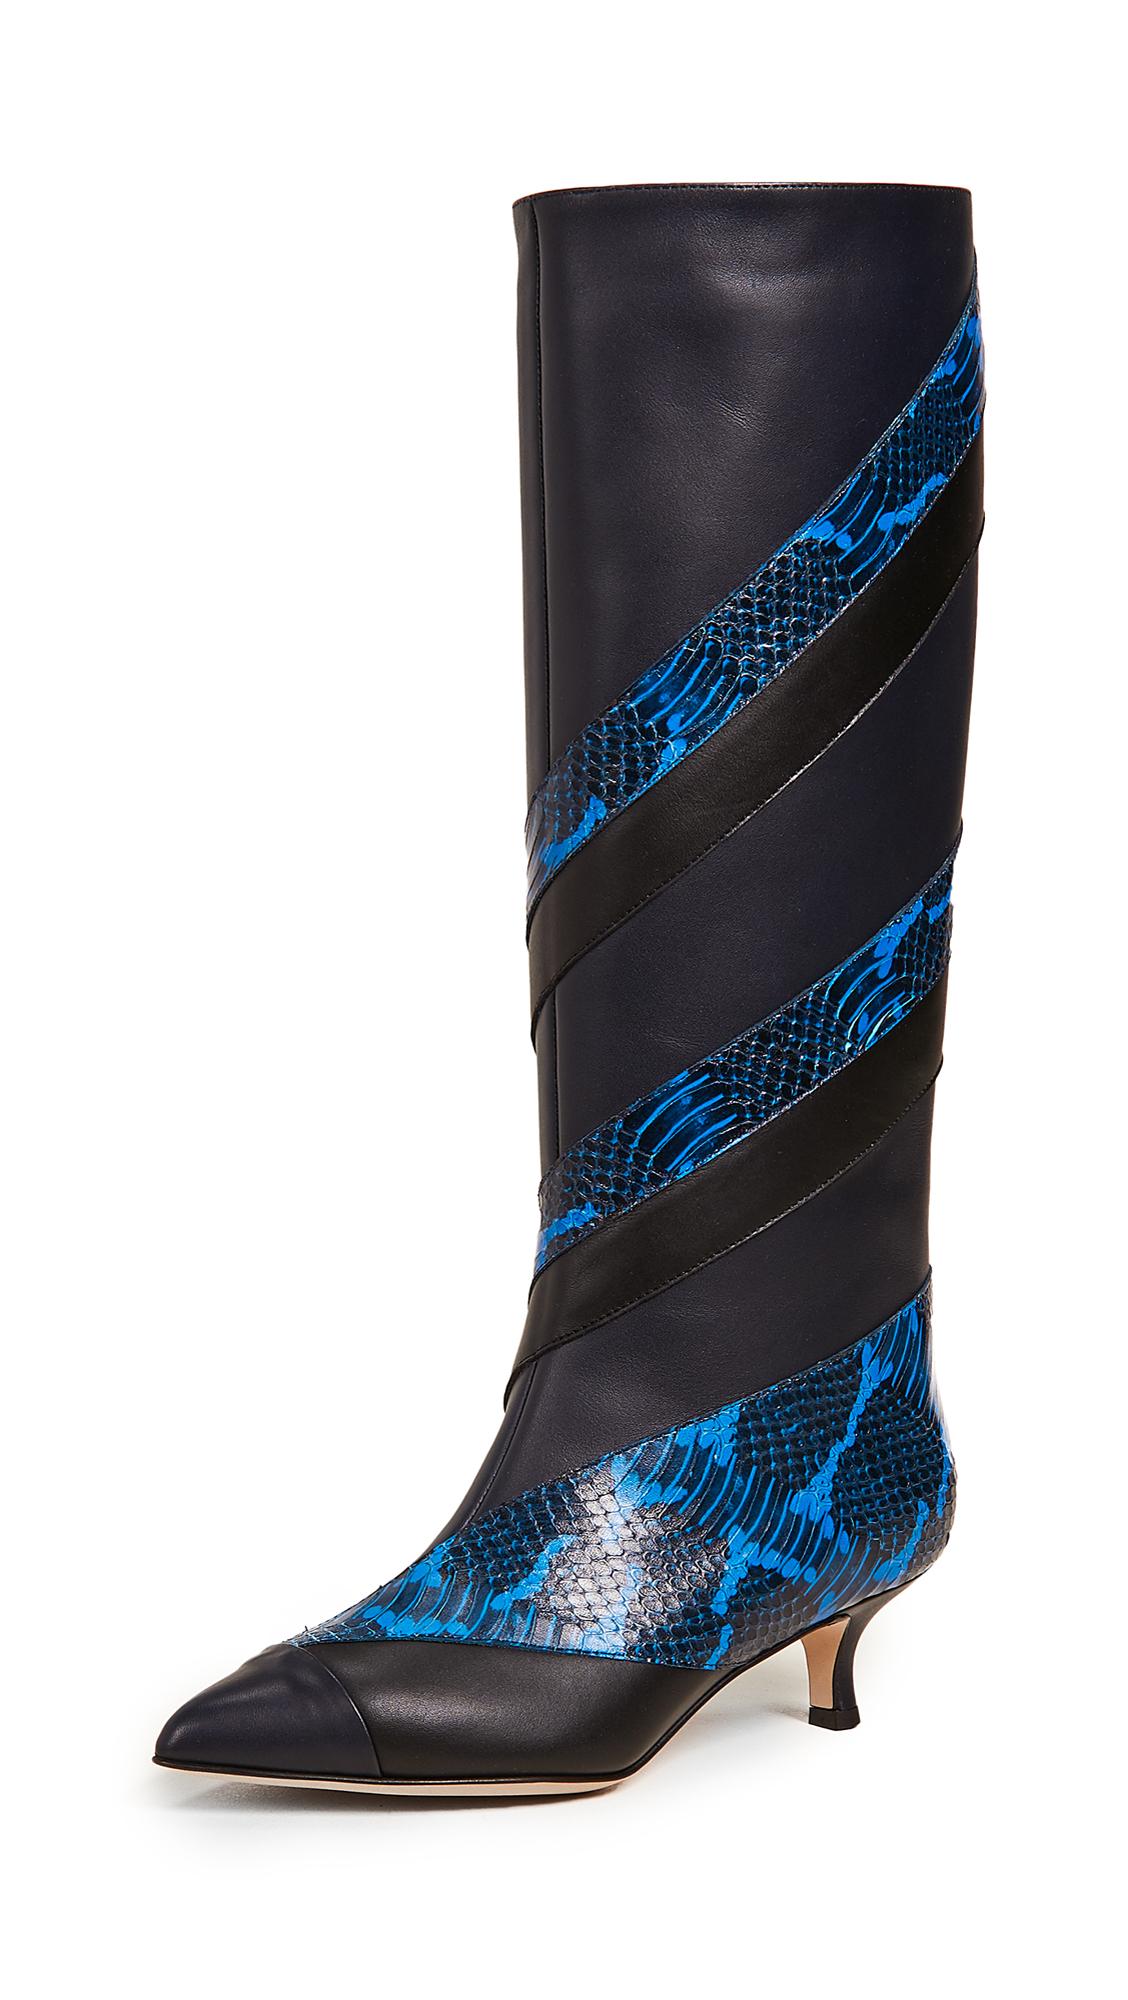 Tibi Hart Boots - Dark Electric Blue Multi